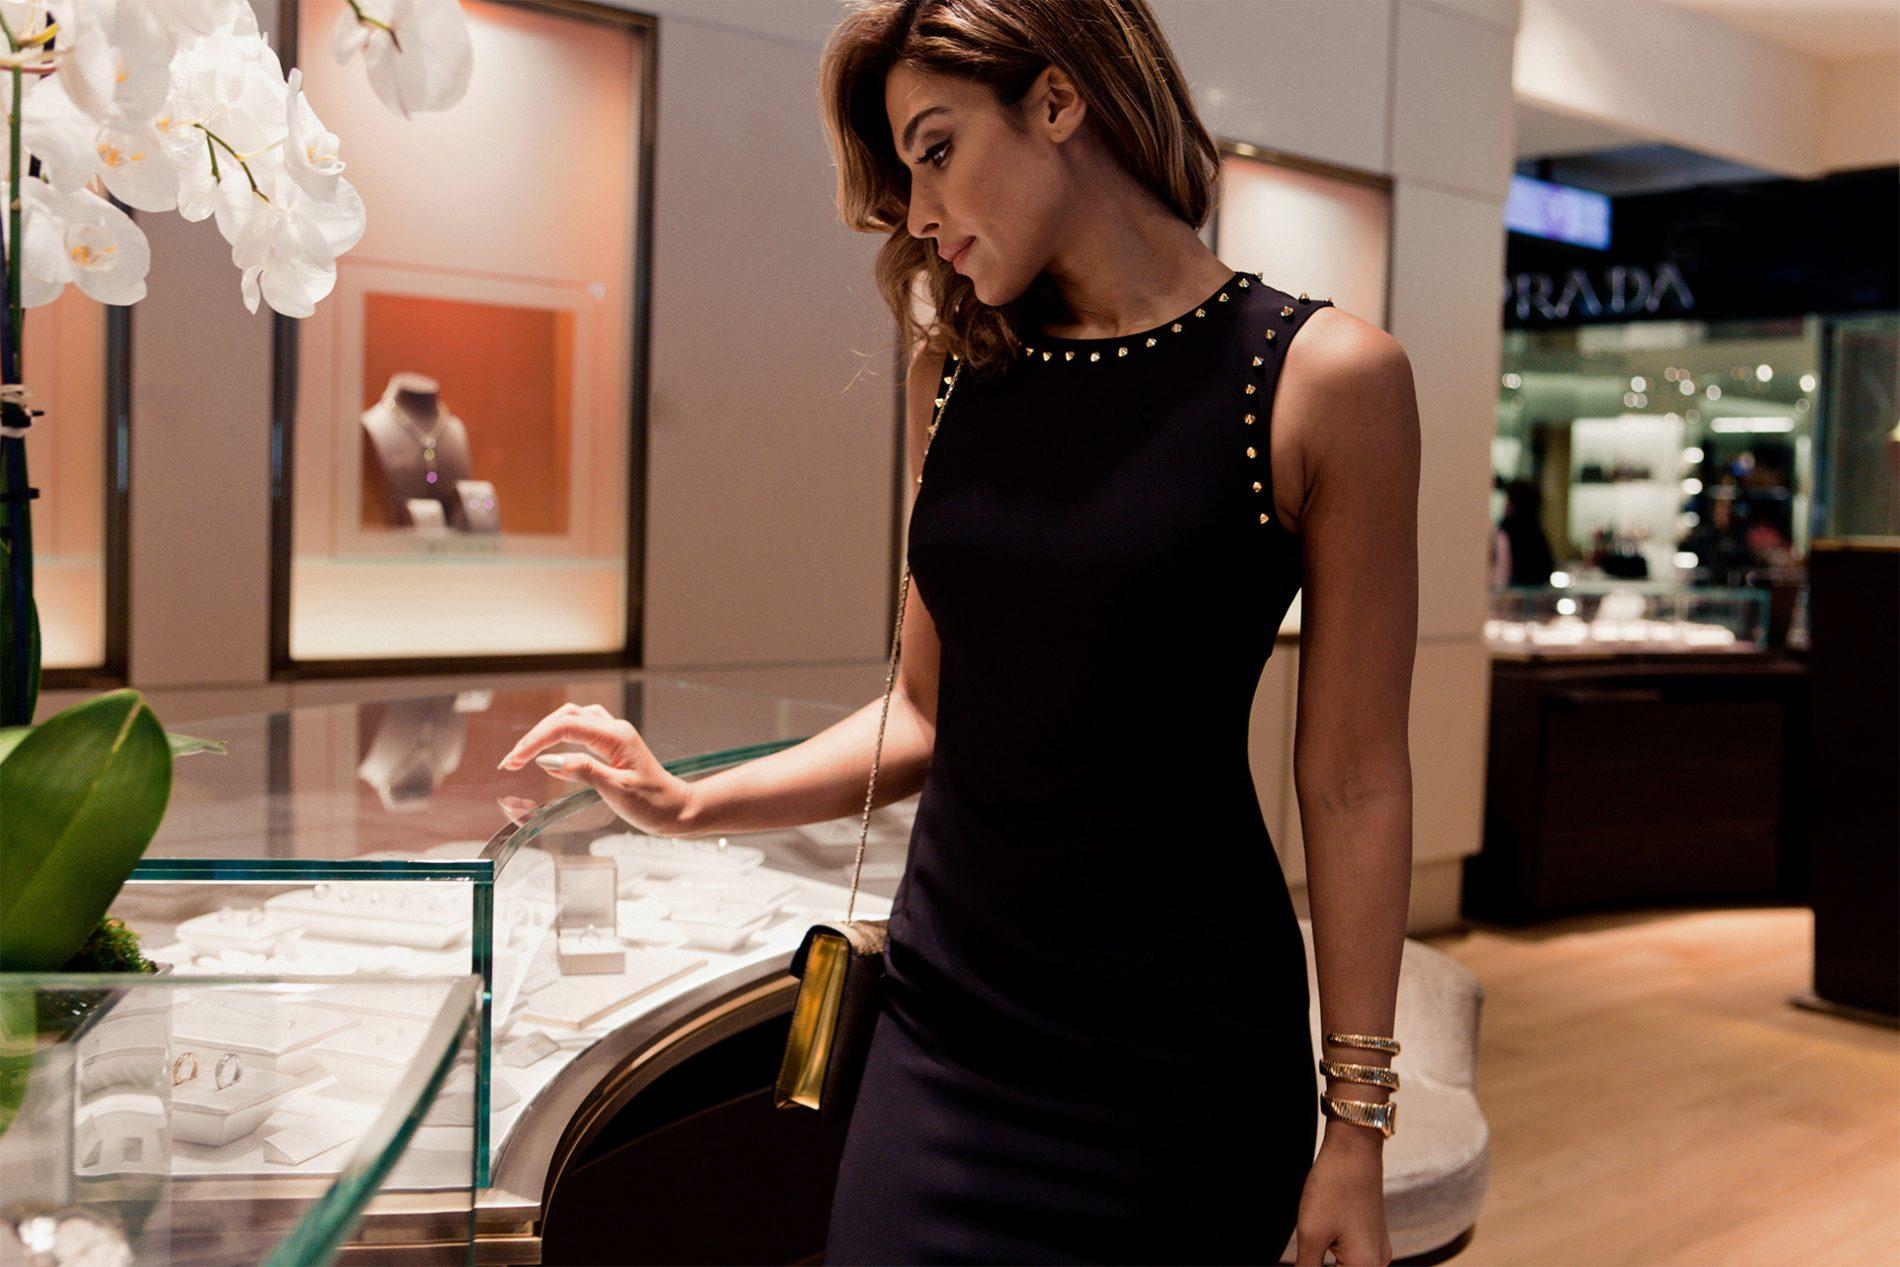 Yalda Golsharifi Blogger Luxury Watches Bulgari Jaeger-LeCoultre Madrid